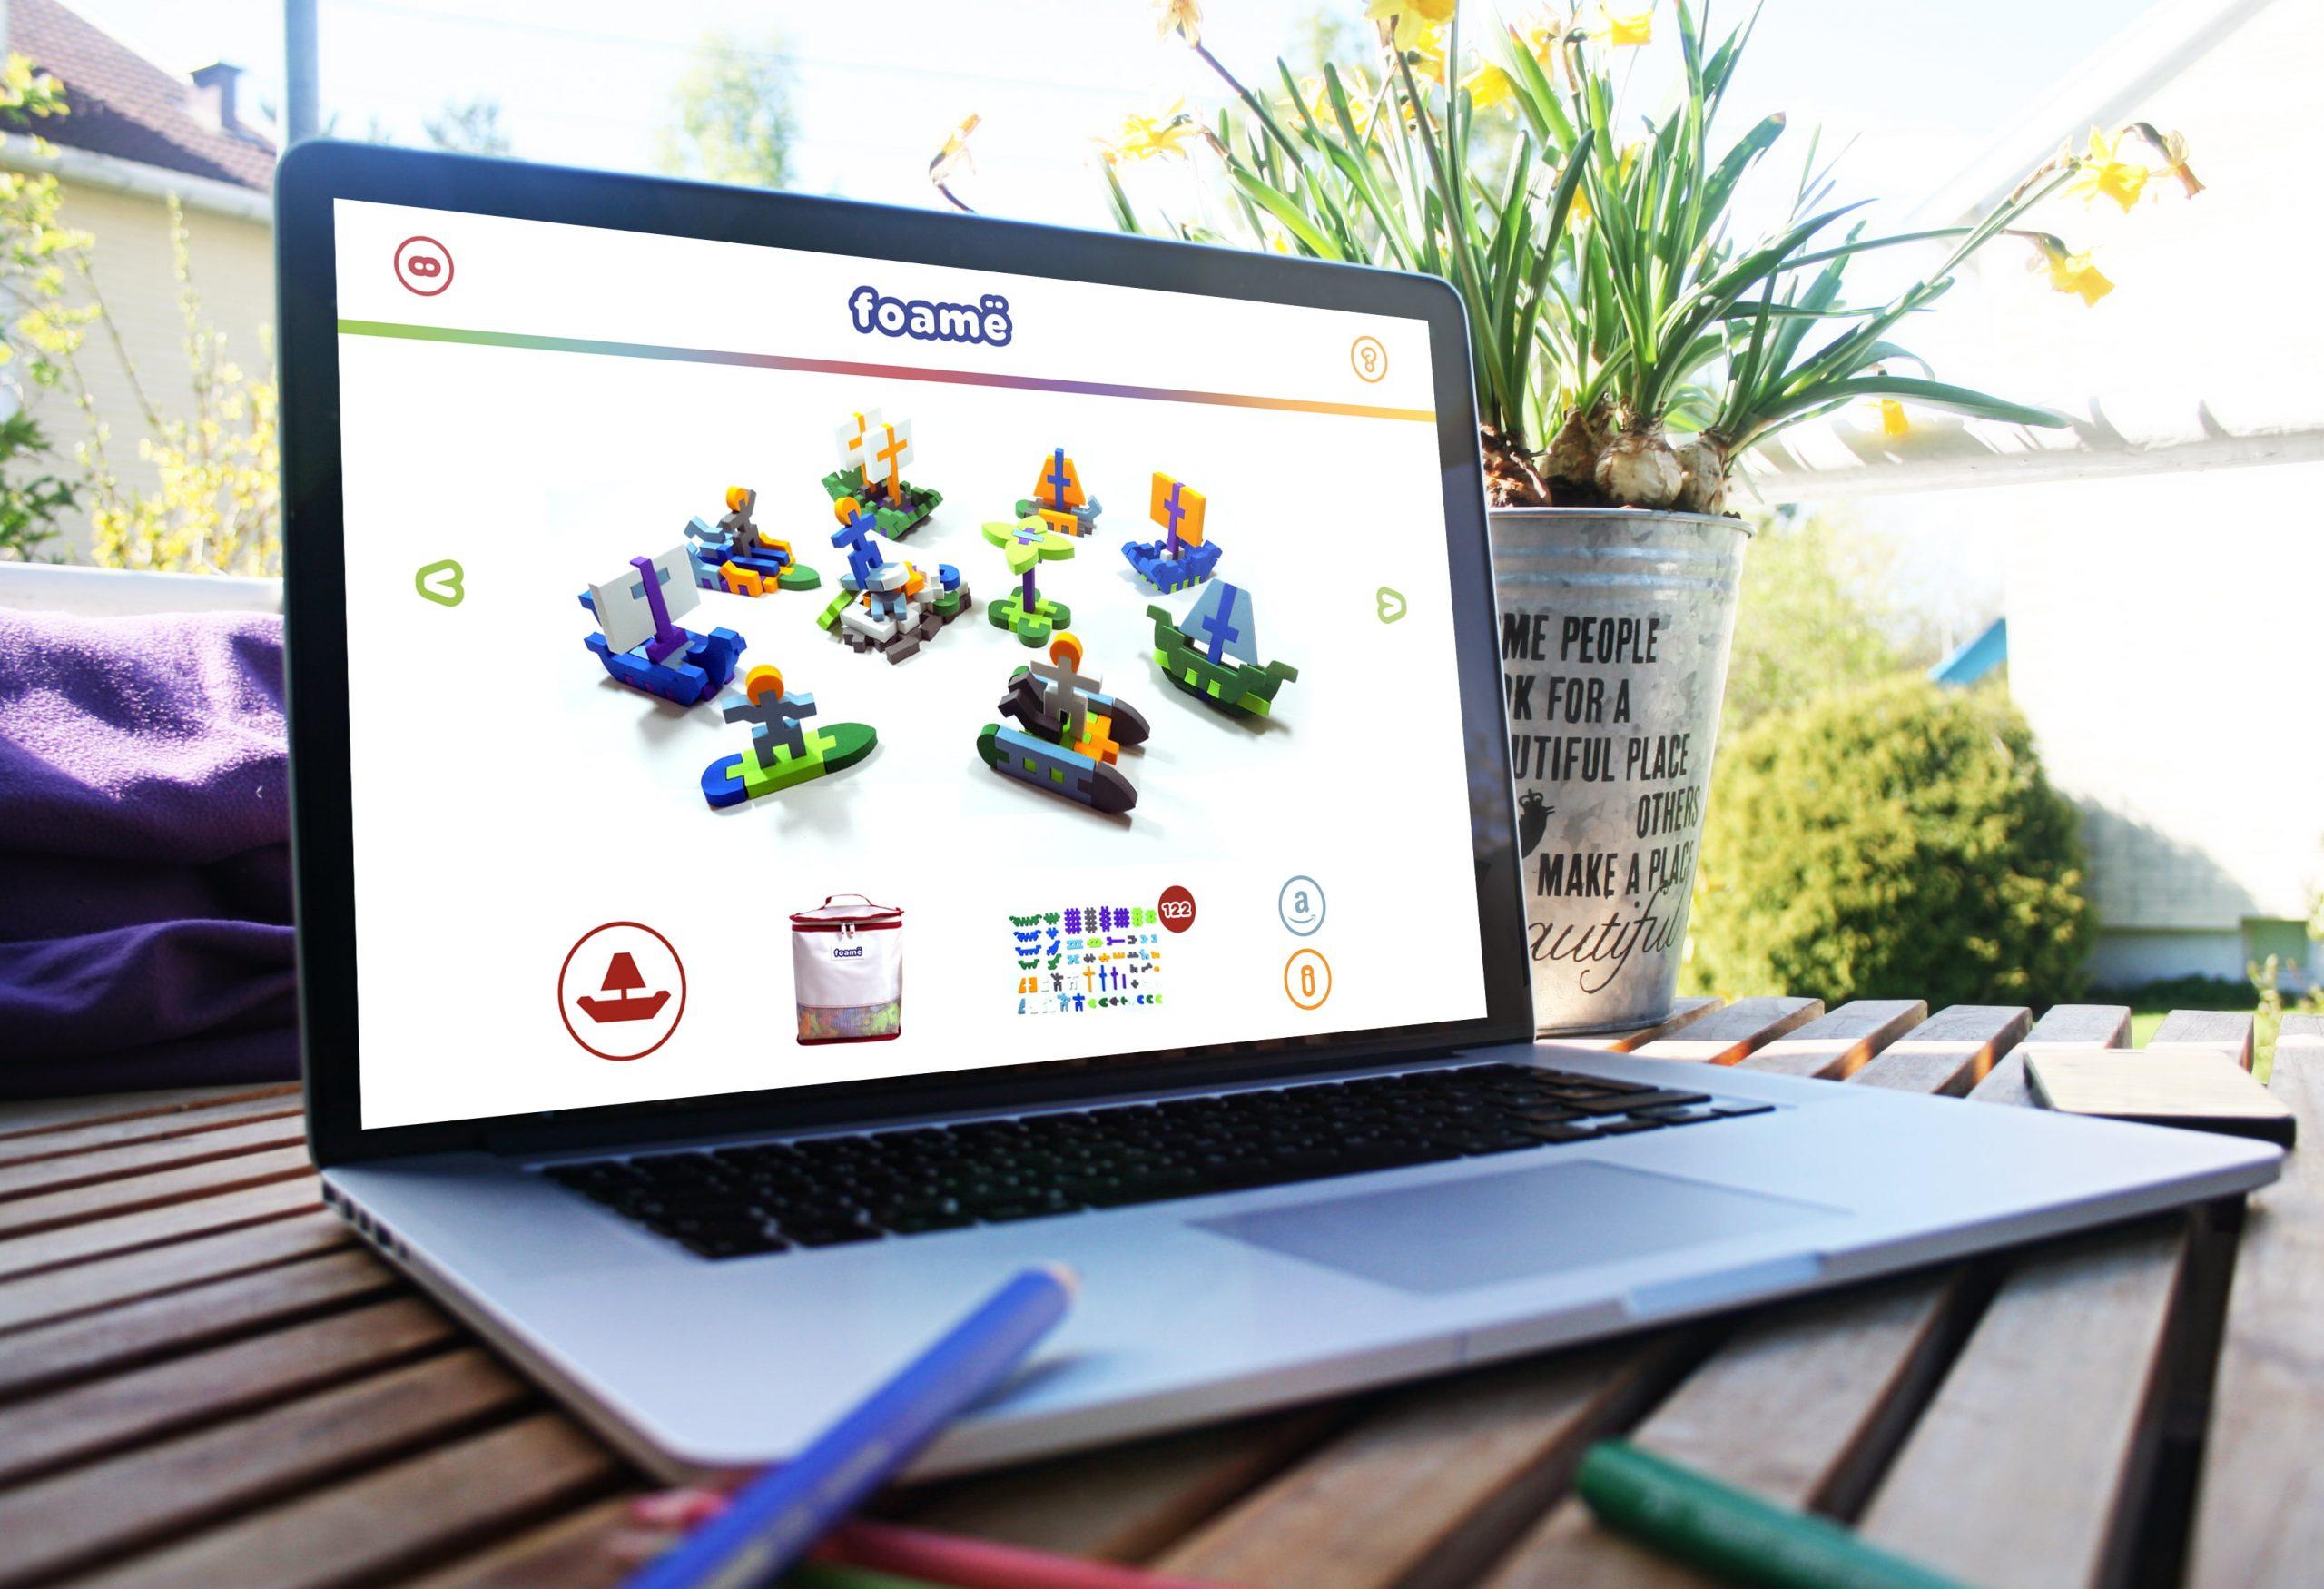 Foame website displayed on laptop